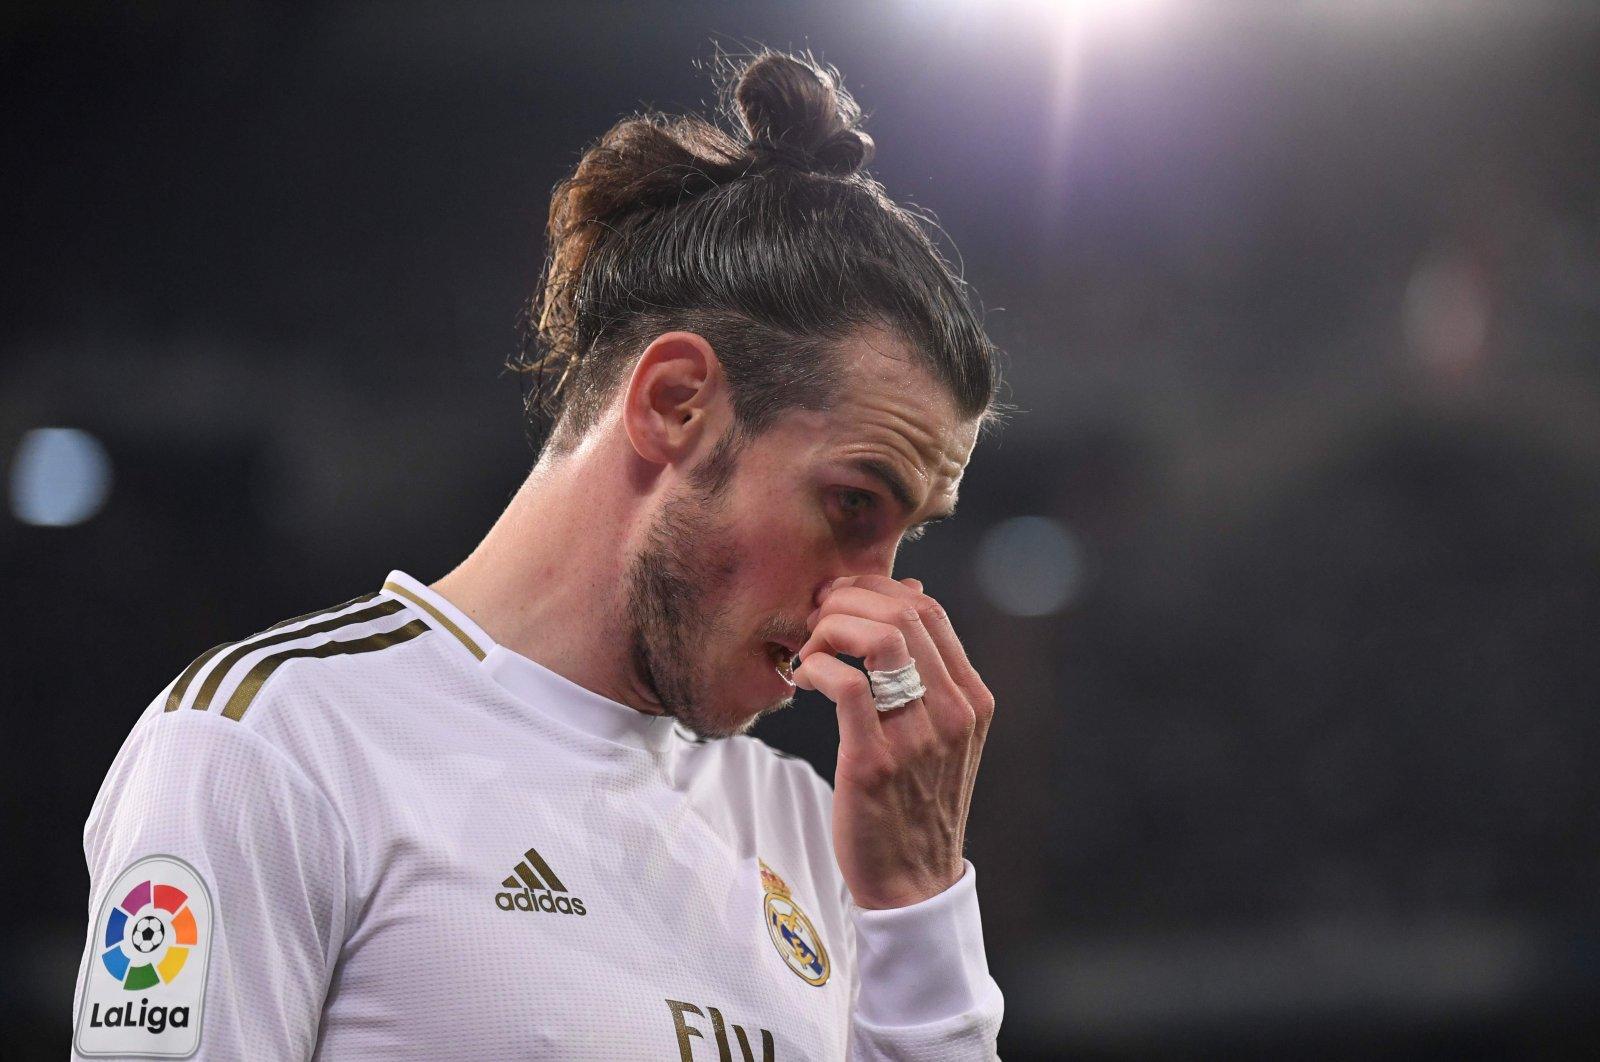 Real Madrid's Gareth Bale reacts during a La Liga match against Celta de Vigo, in Madrid, Spain, Feb. 16, 2020. (AFP Photo)